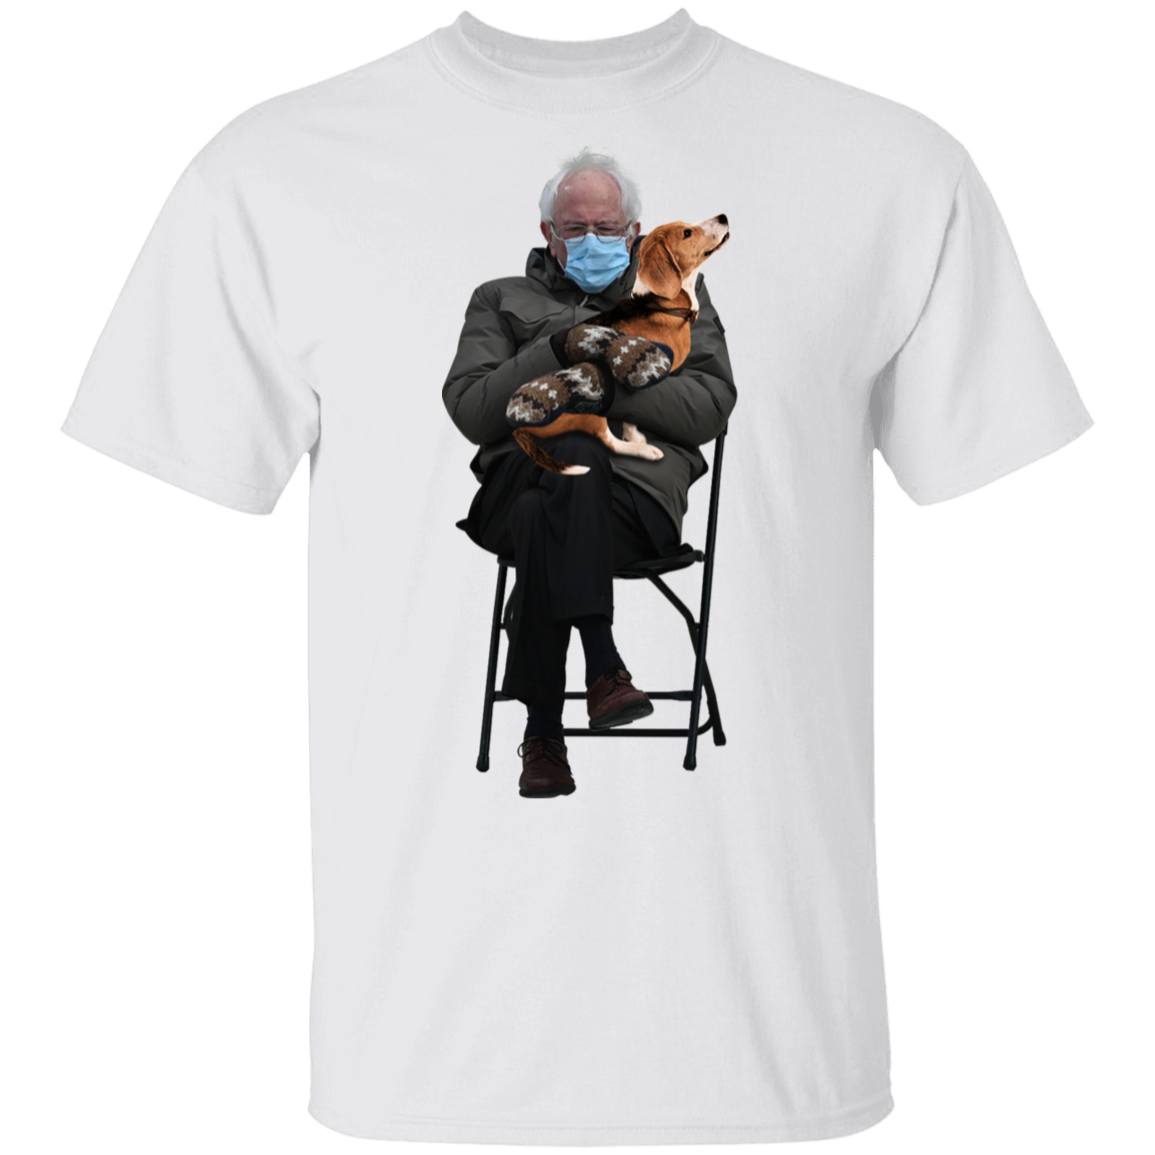 Bernie Meme And Beagle Shirt Funny Chairman Sanders Buy Bernie Sanders Merchandise In 2021 Printed Shirts Shirts Bernie Shirt